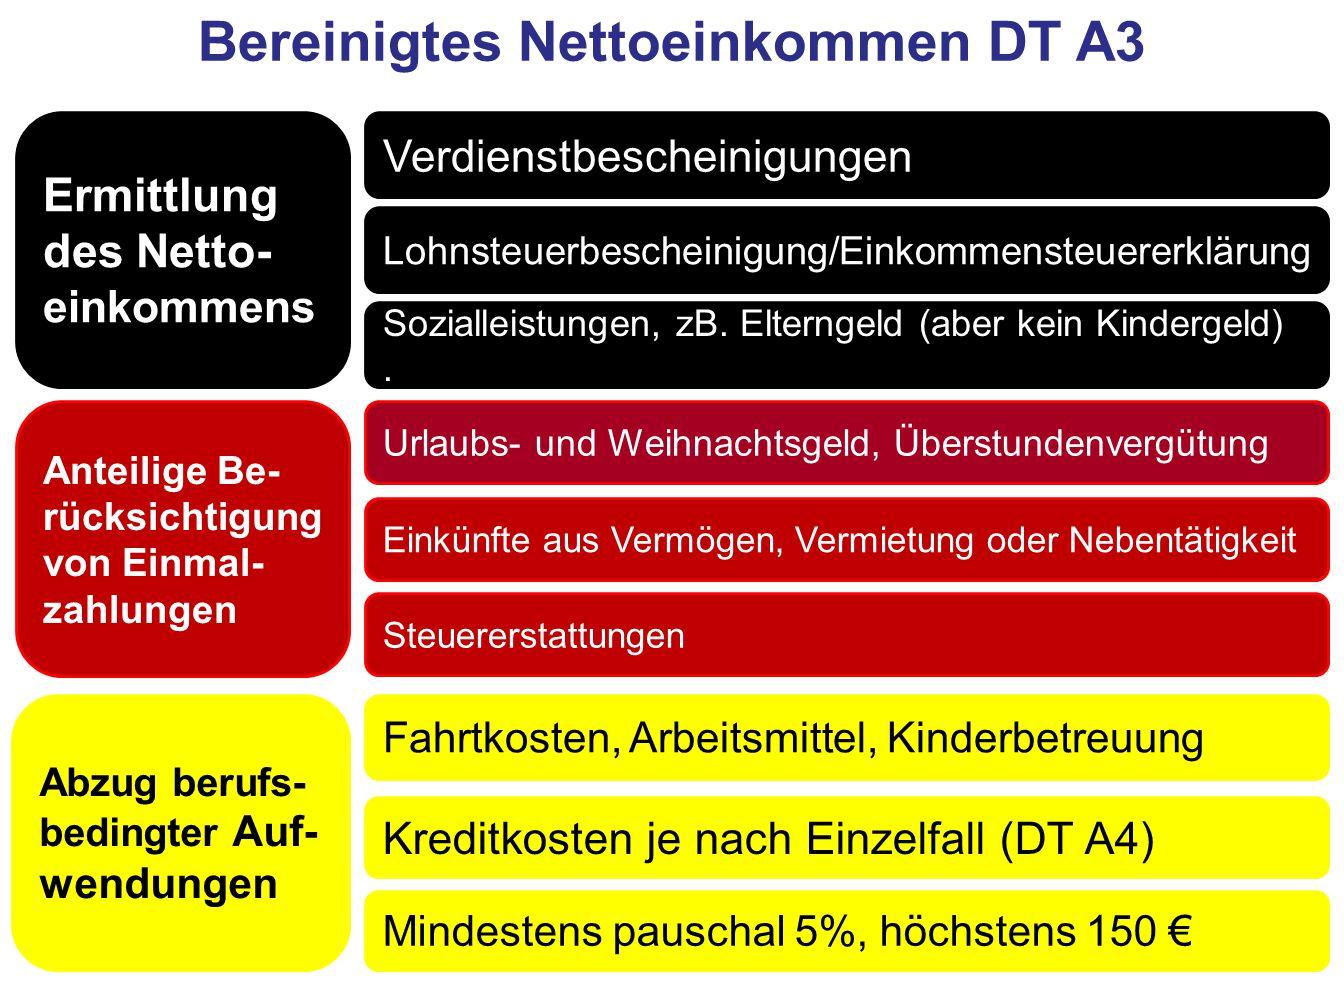 Bereinigtes Nettoeinkommen DT A3